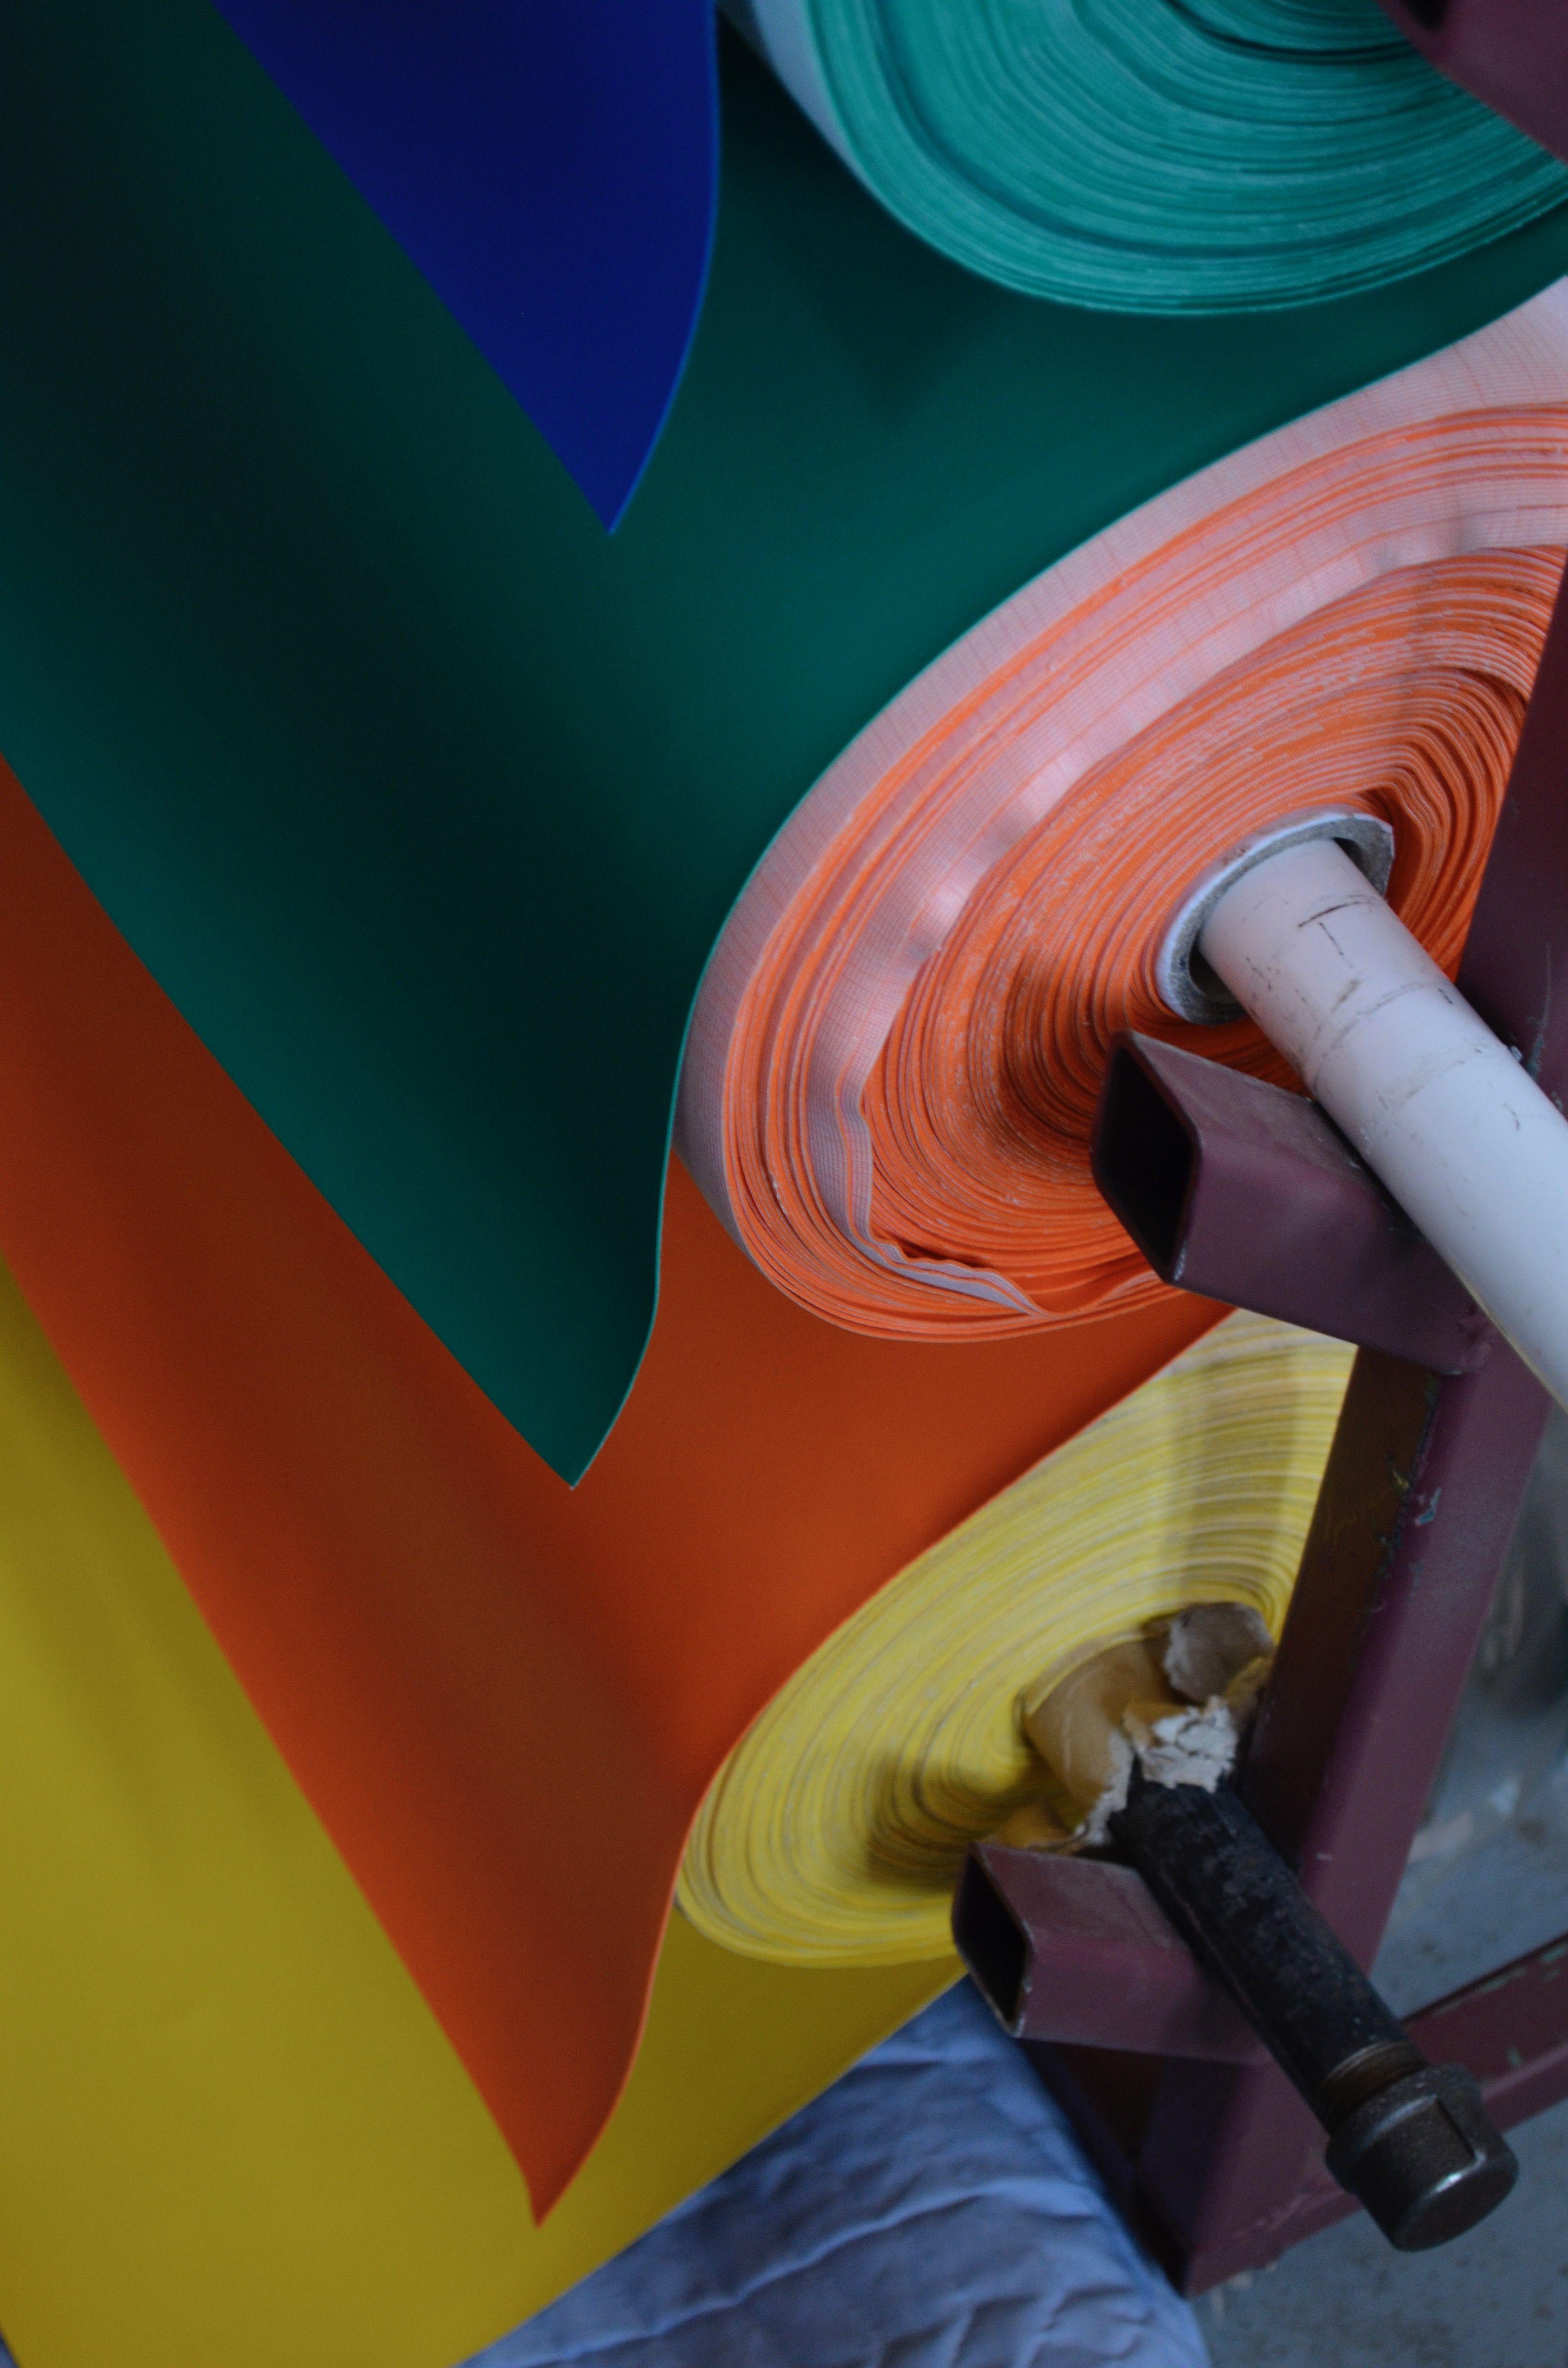 30 Gauge Clear Vinyl 12 85 Onlinefabricstore Net Vinyl Fabric Clear Vinyl Vinyl